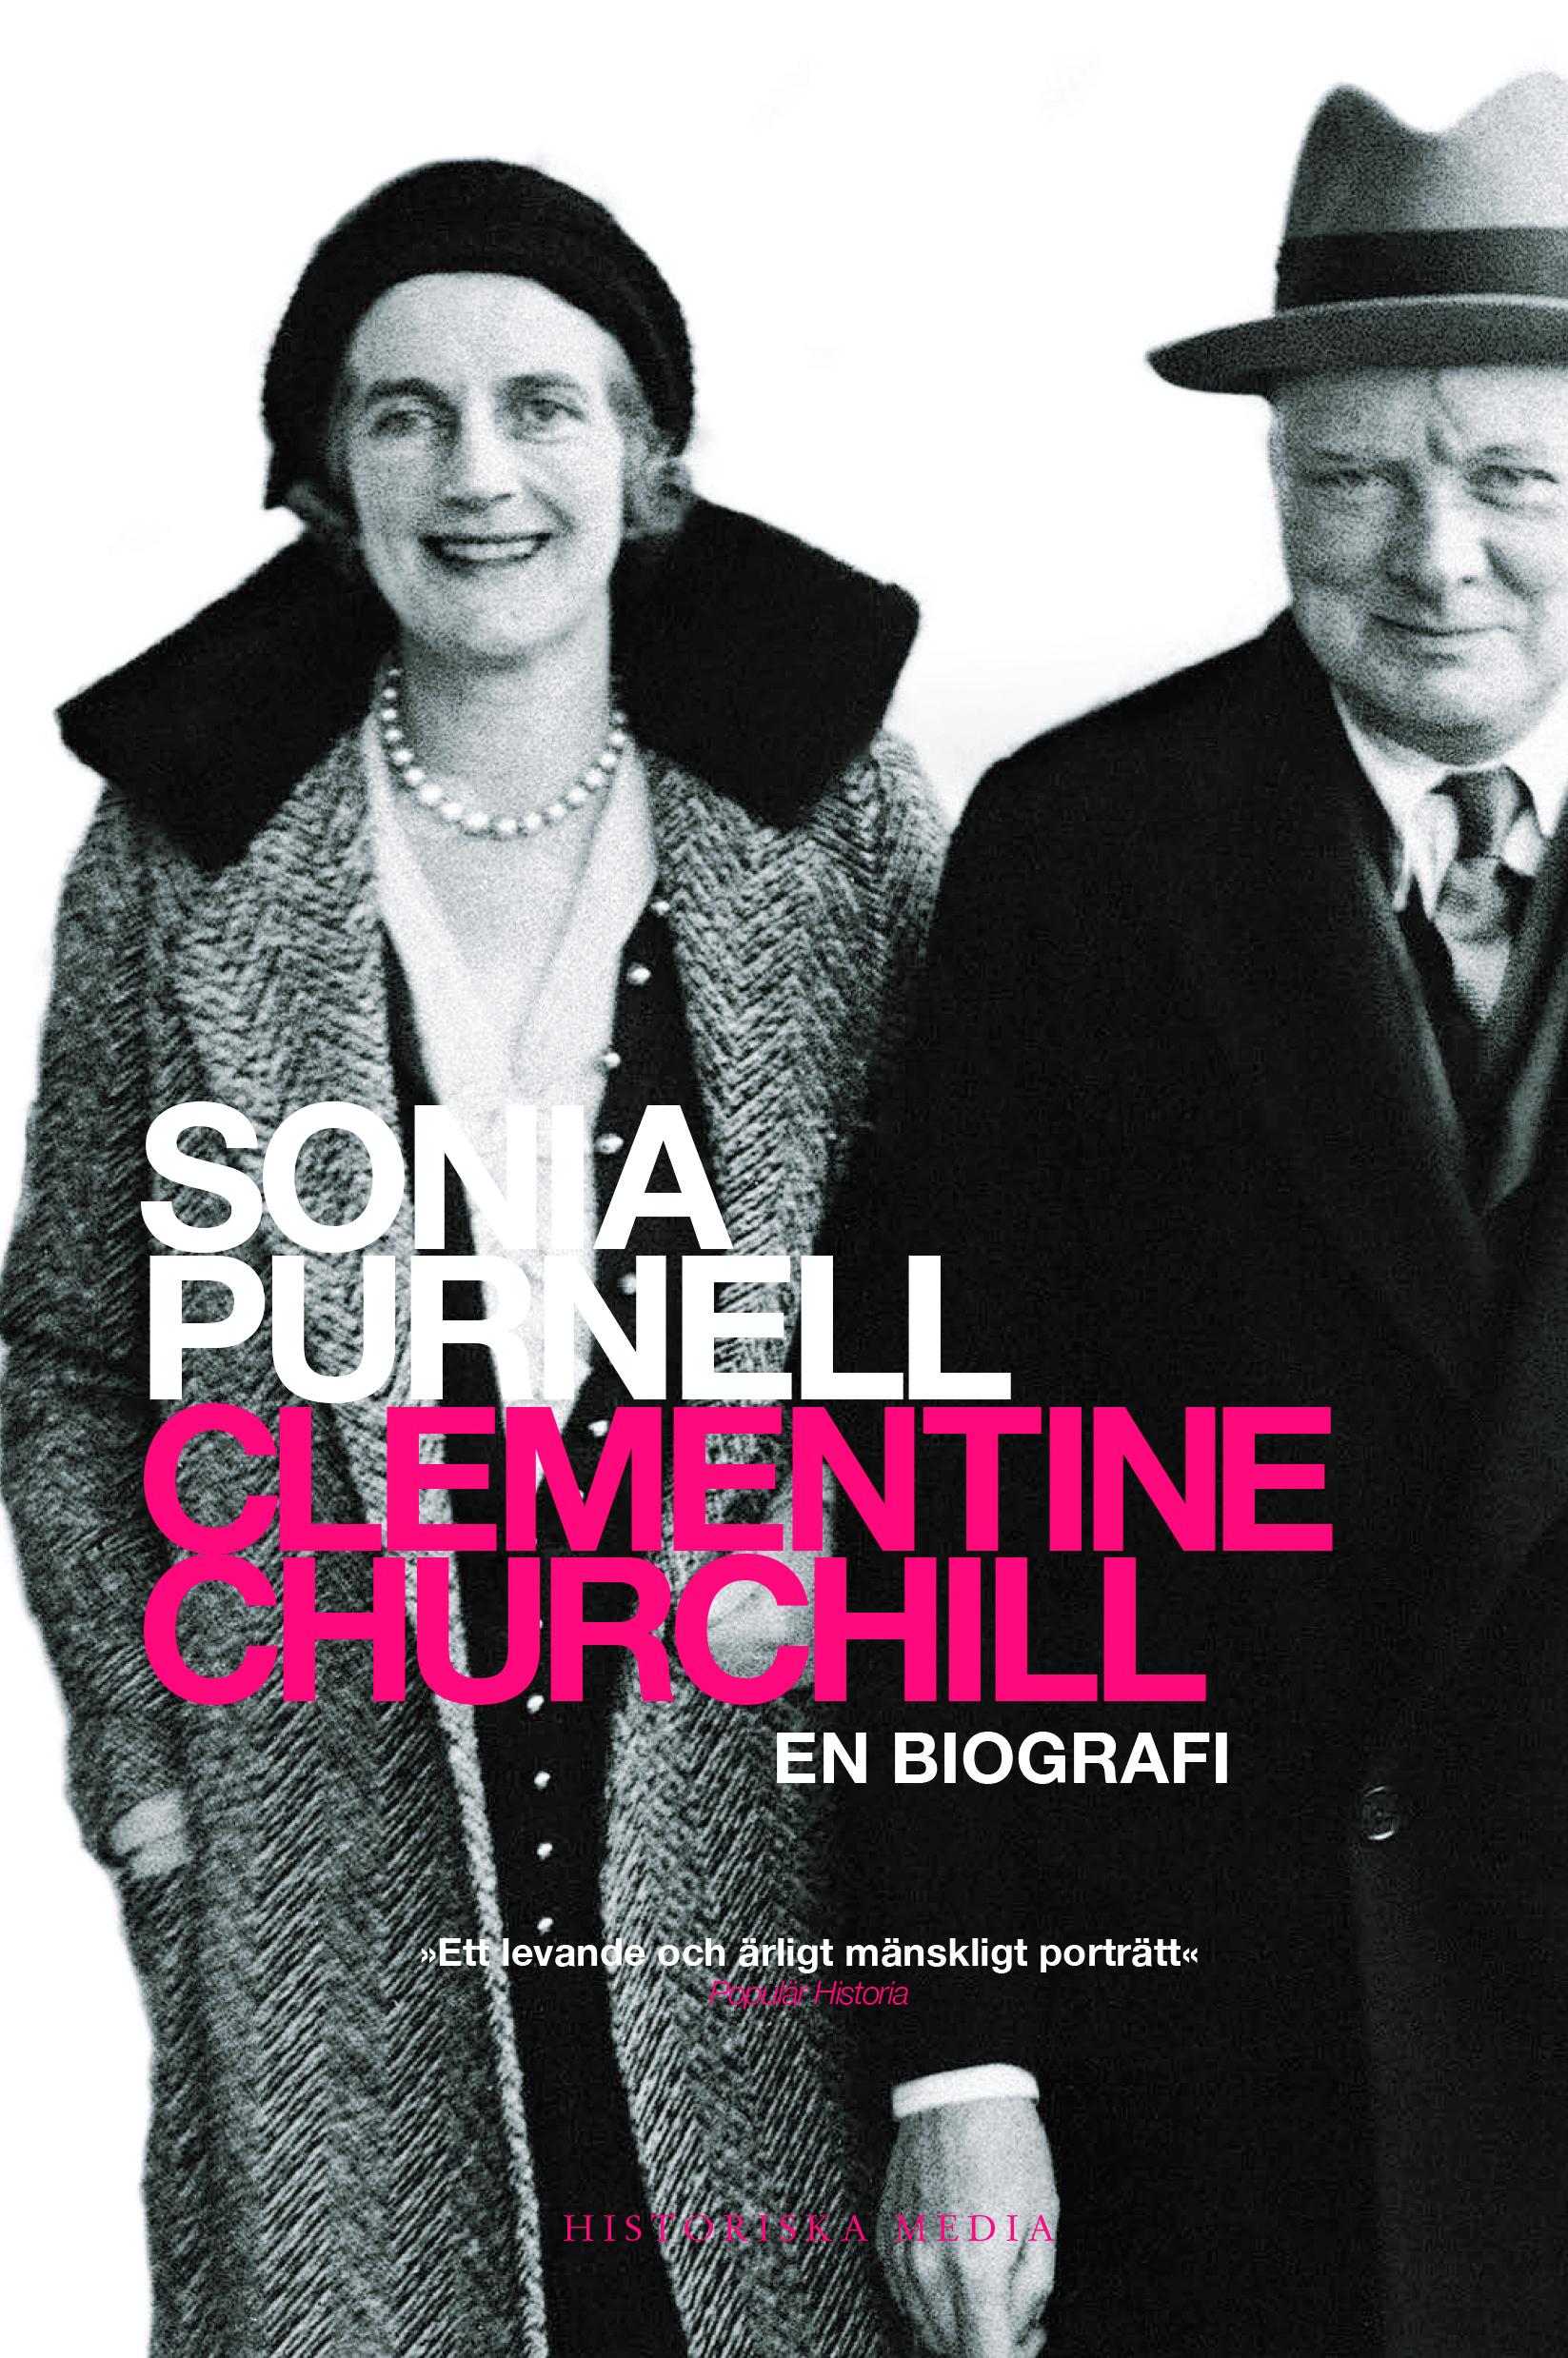 Clementine Churchill en biografi